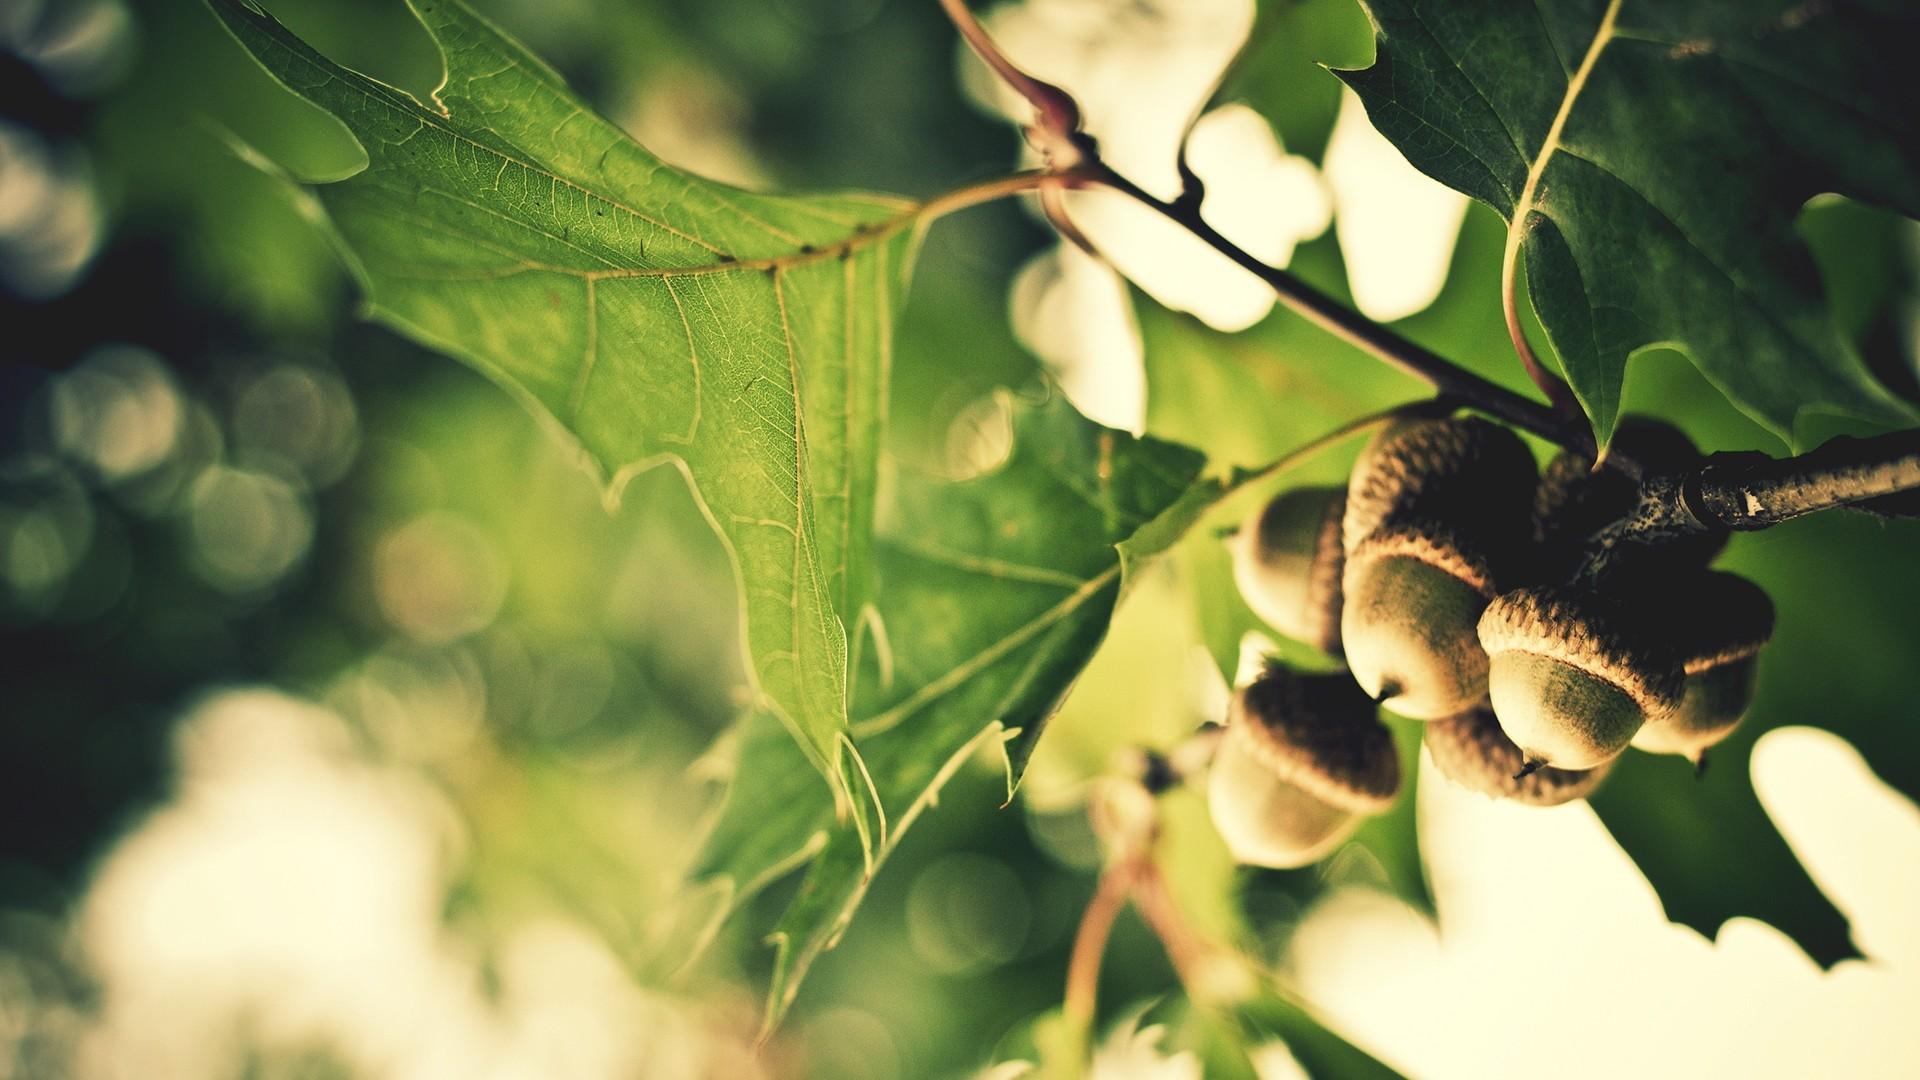 acorn wallpaper 23364